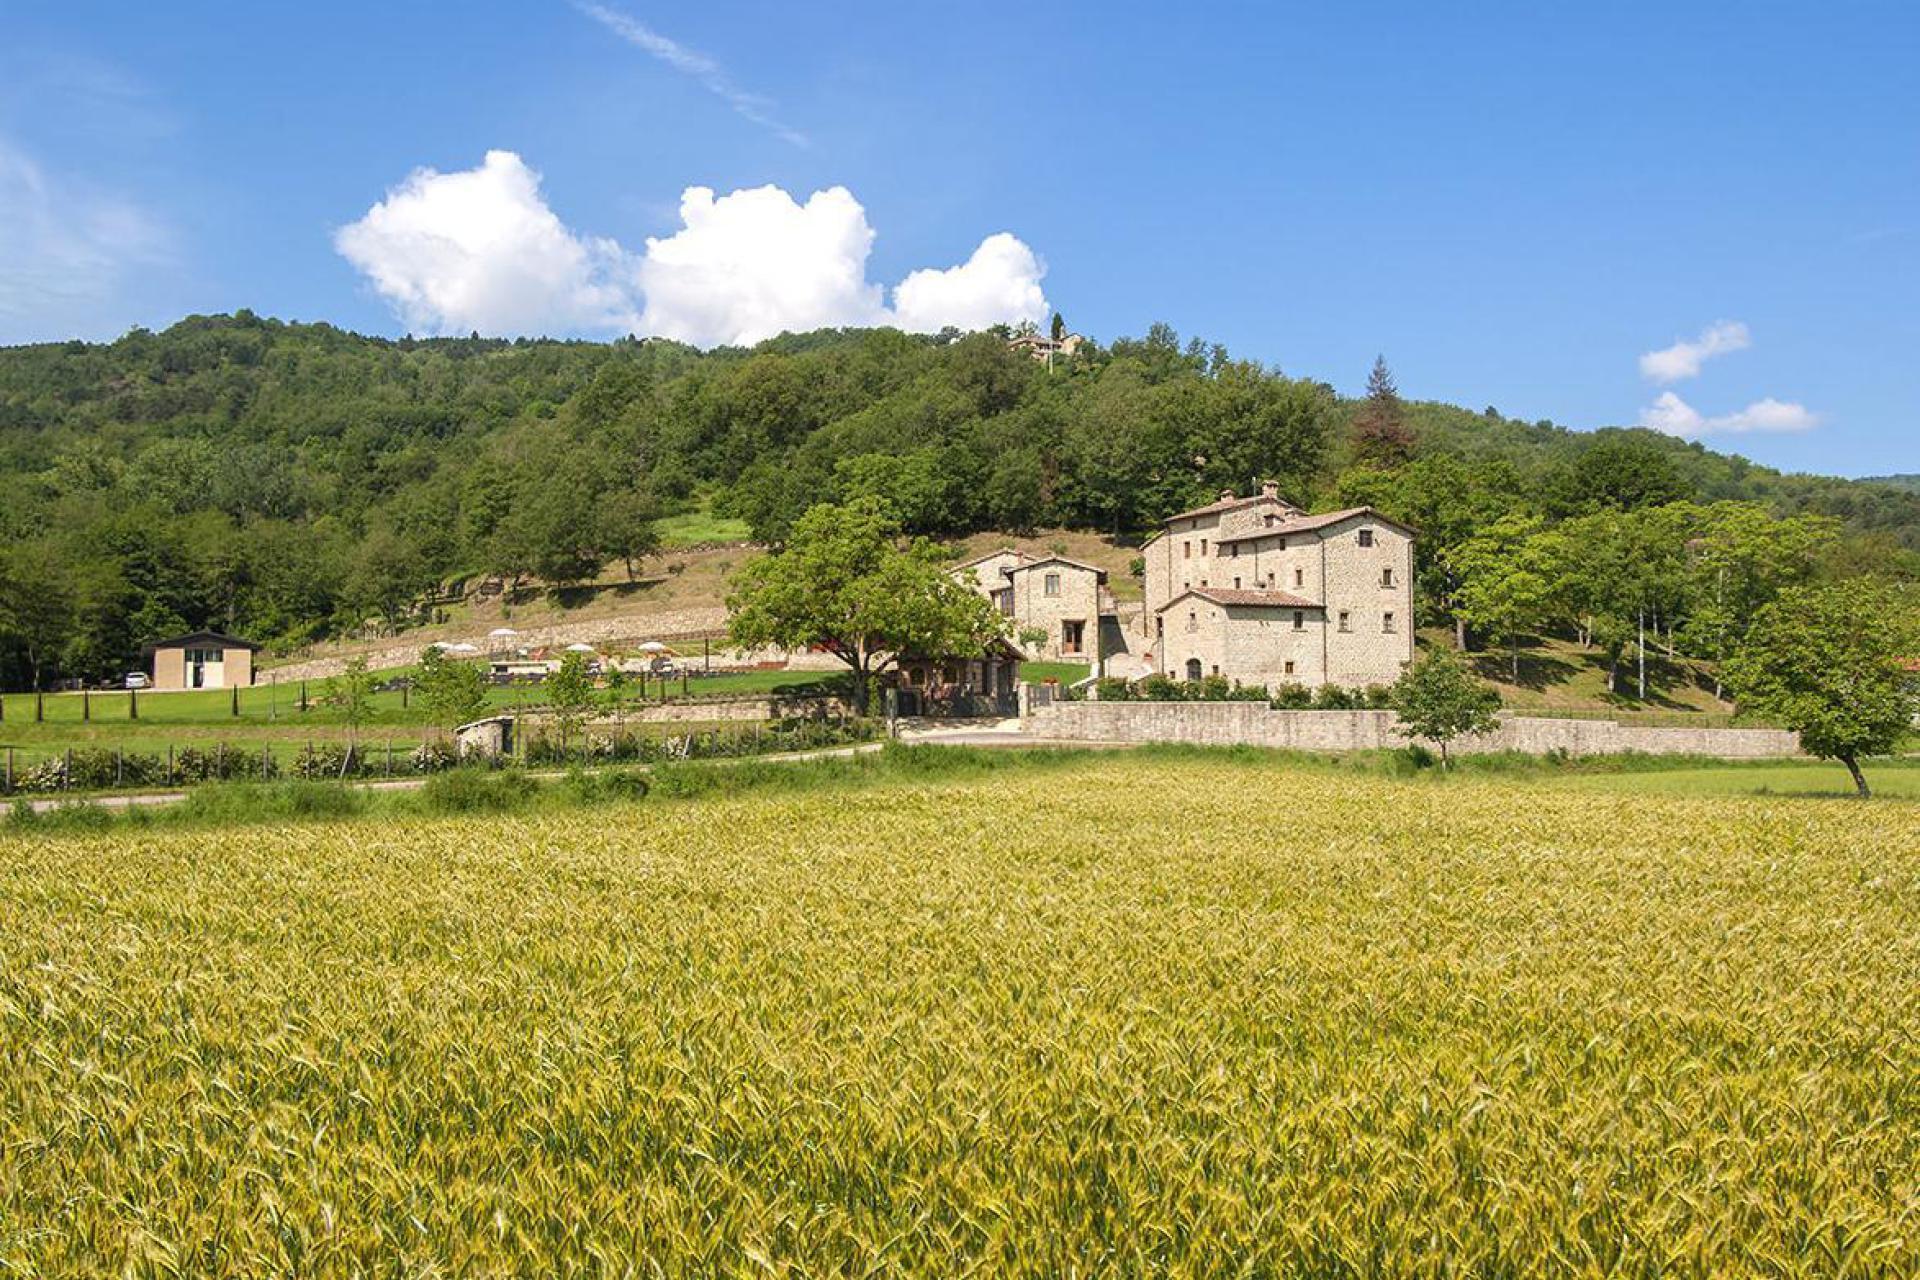 Agriturismo Toscana Agriturismo in zona tranquilla in Toscana, bella vista